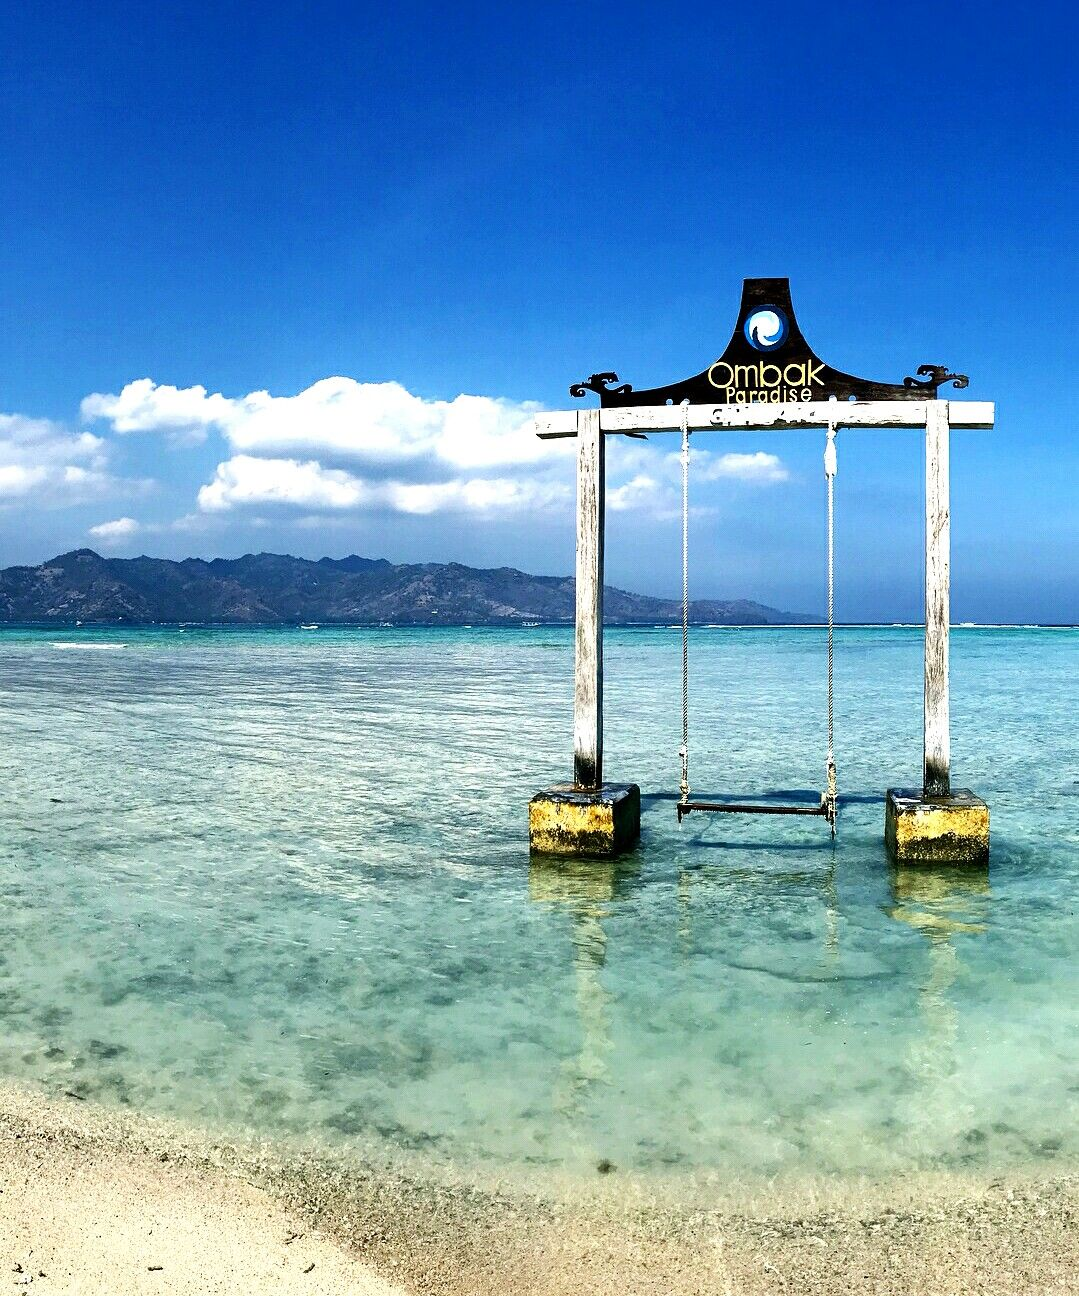 Photo of Bali By rachael pereira